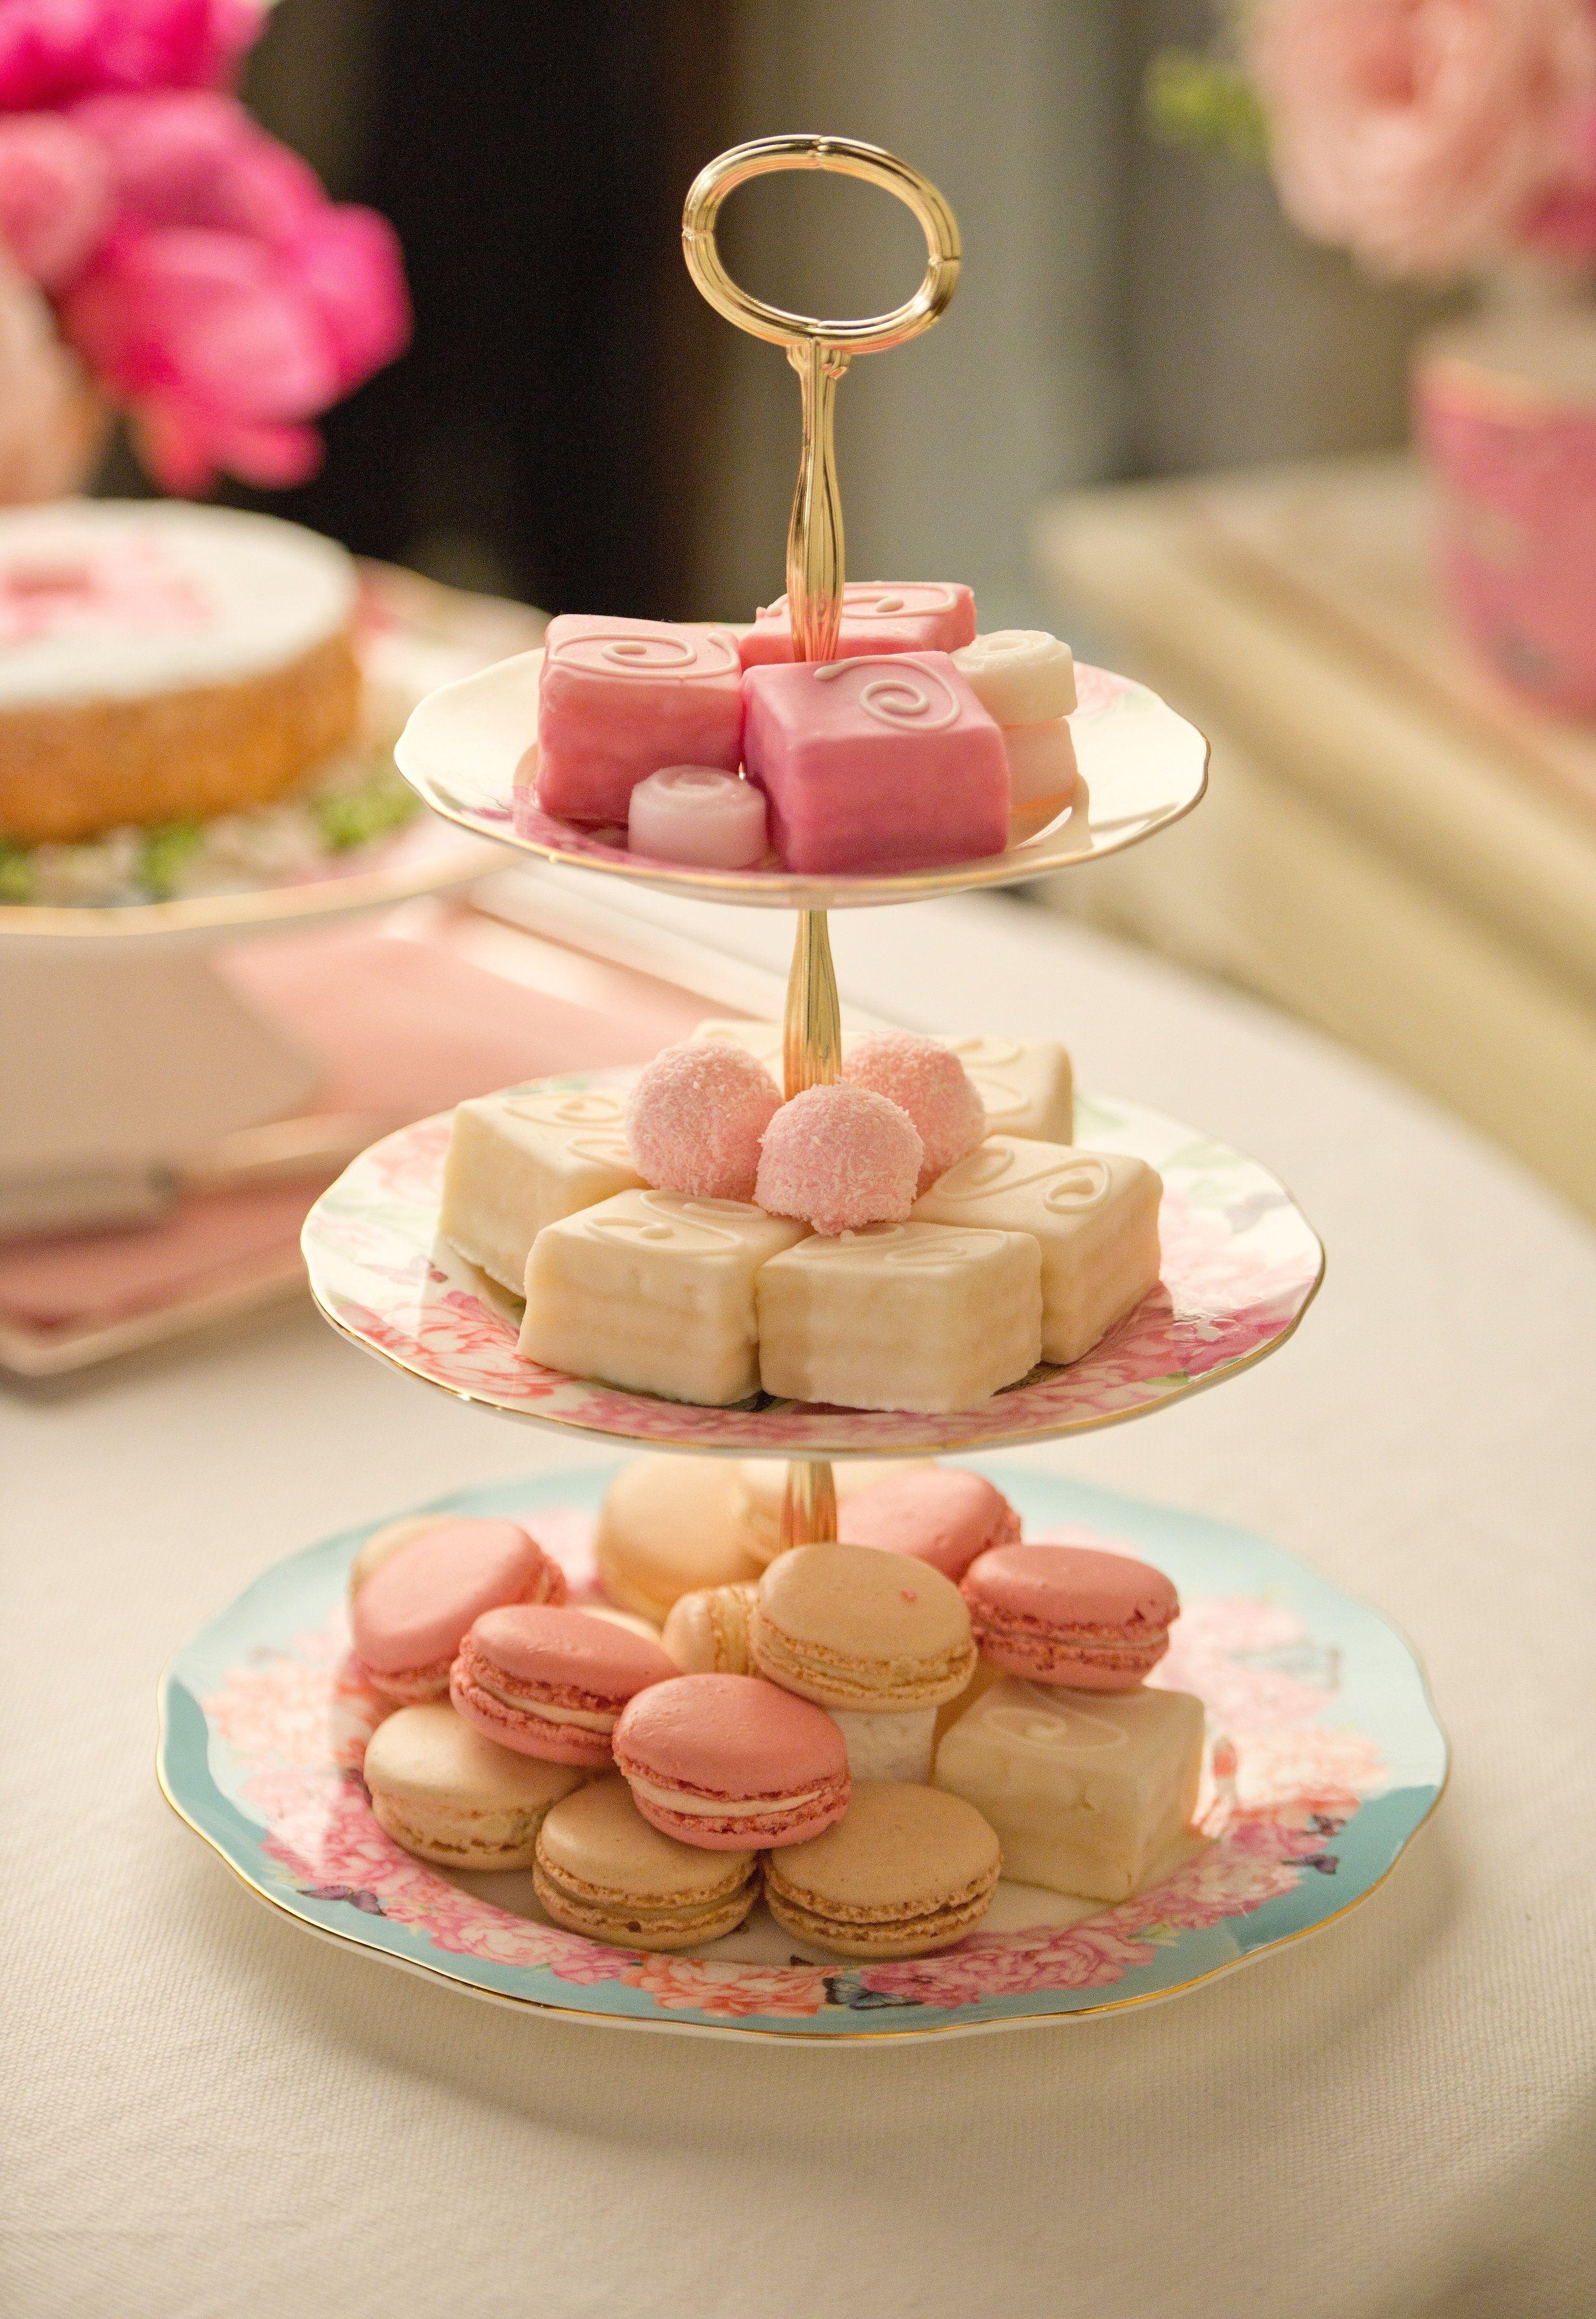 Royal Albert - Miranda Kerr   Tea Party ✻ Sweets   Pinterest ...